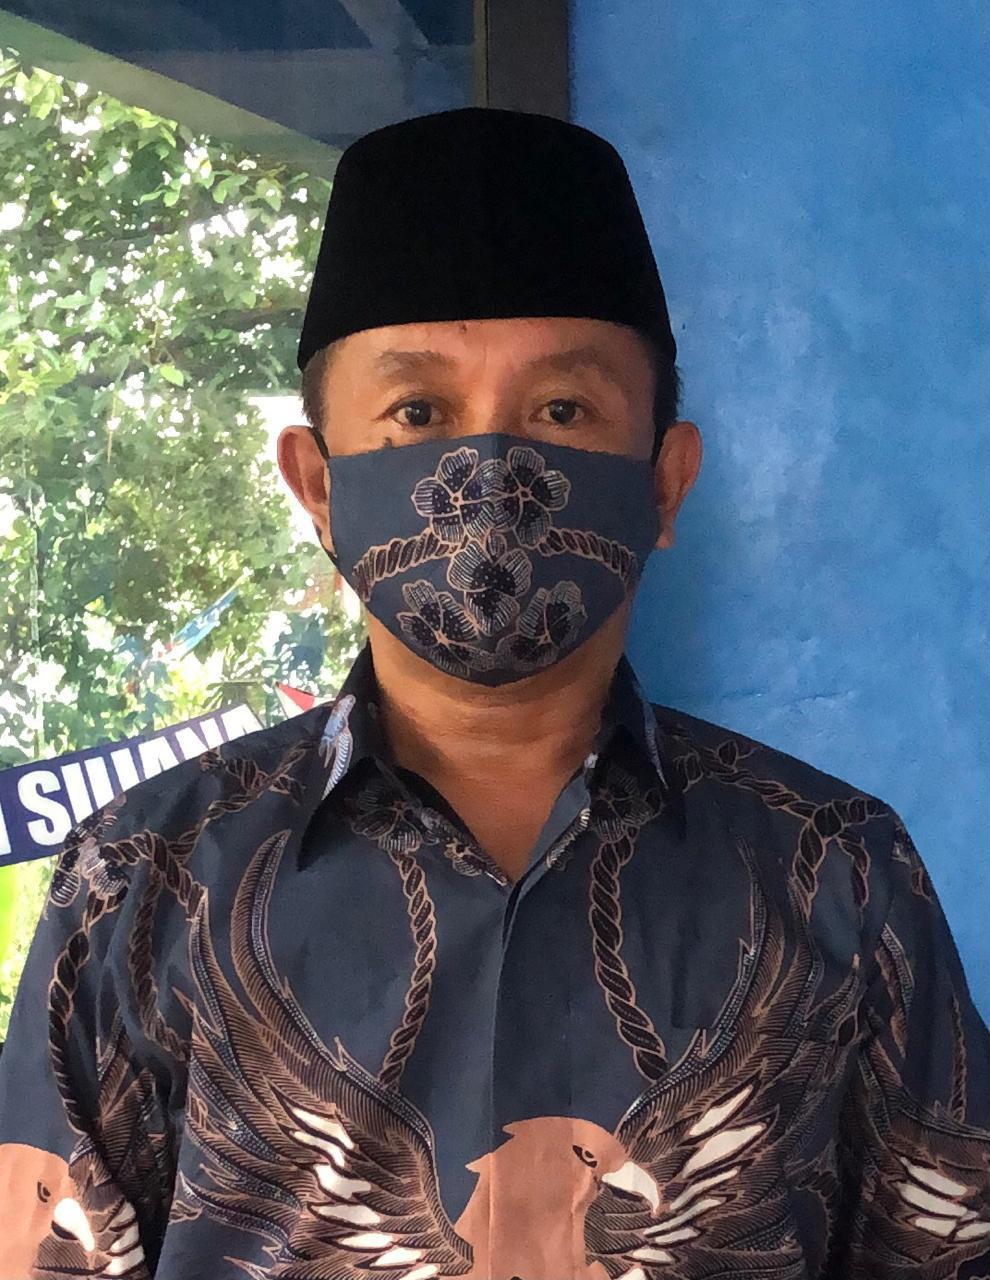 Gambar Jika KLB Tetap Berlanjut, DPC-PD Kabupaten Pandeglang: Siap Gabung Gempur Untuk Bubarkan Perusak Marwah Partai Demokrat 13